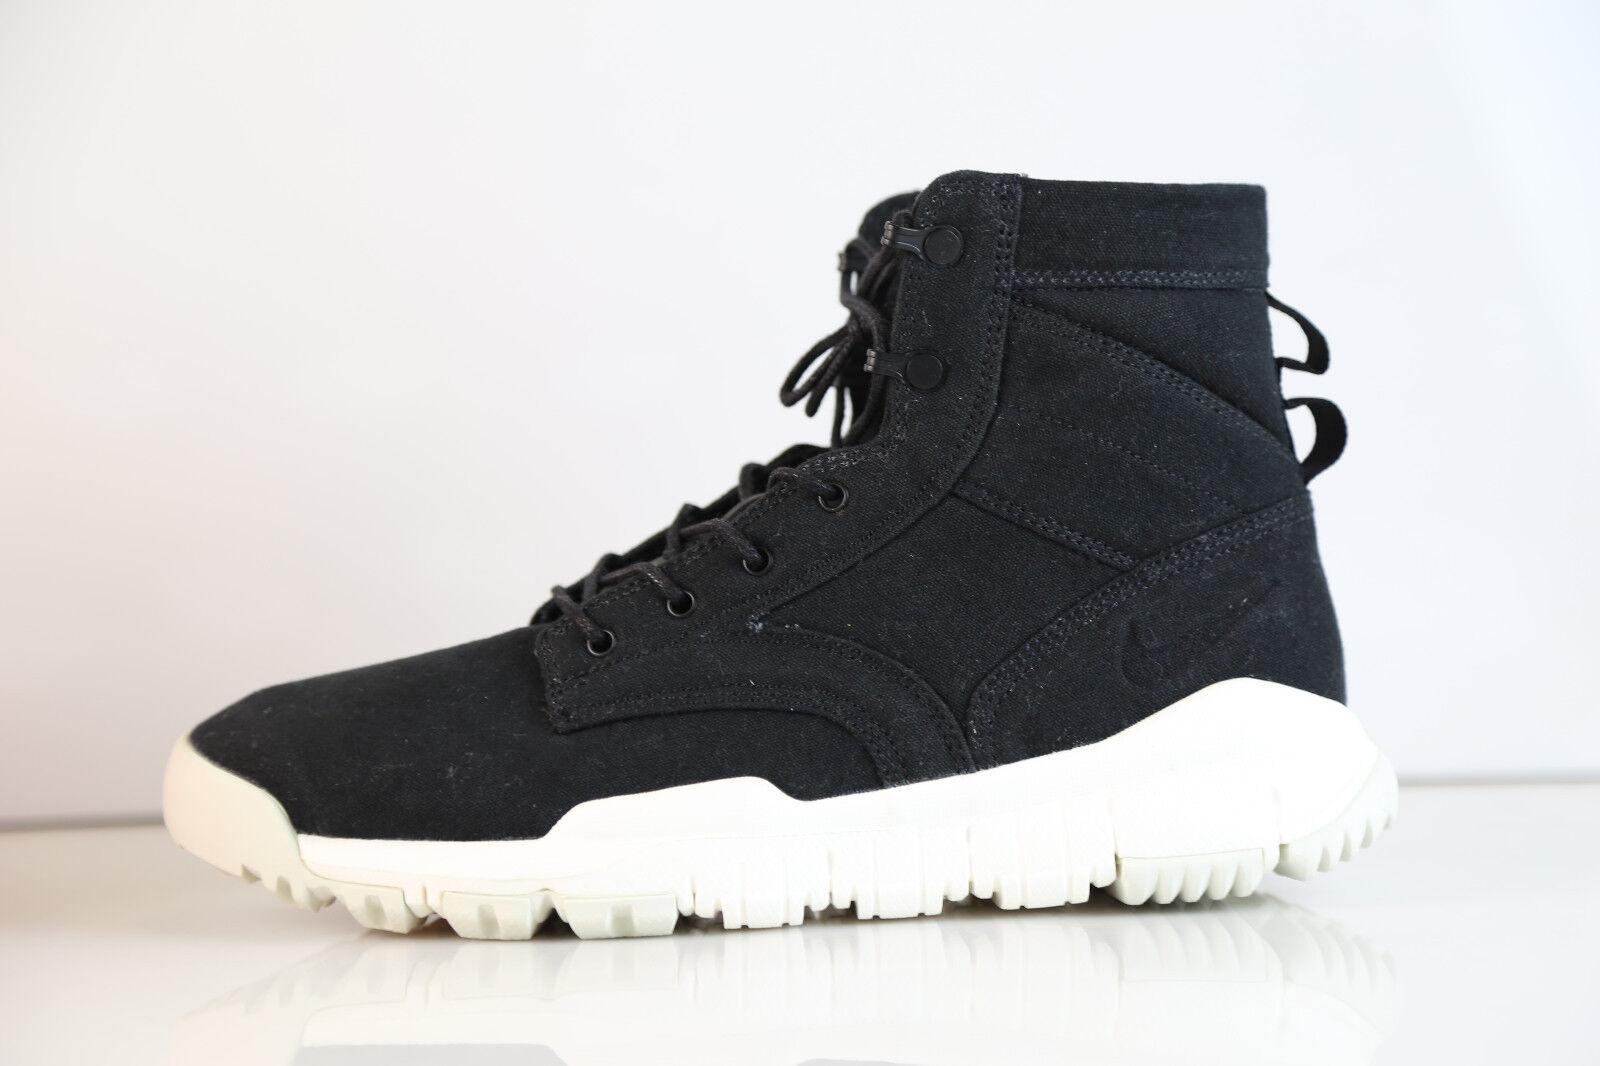 Nike SFB 6' CNVS NSW Black Boot 844577-001 8.5-13 canvas no sf 1